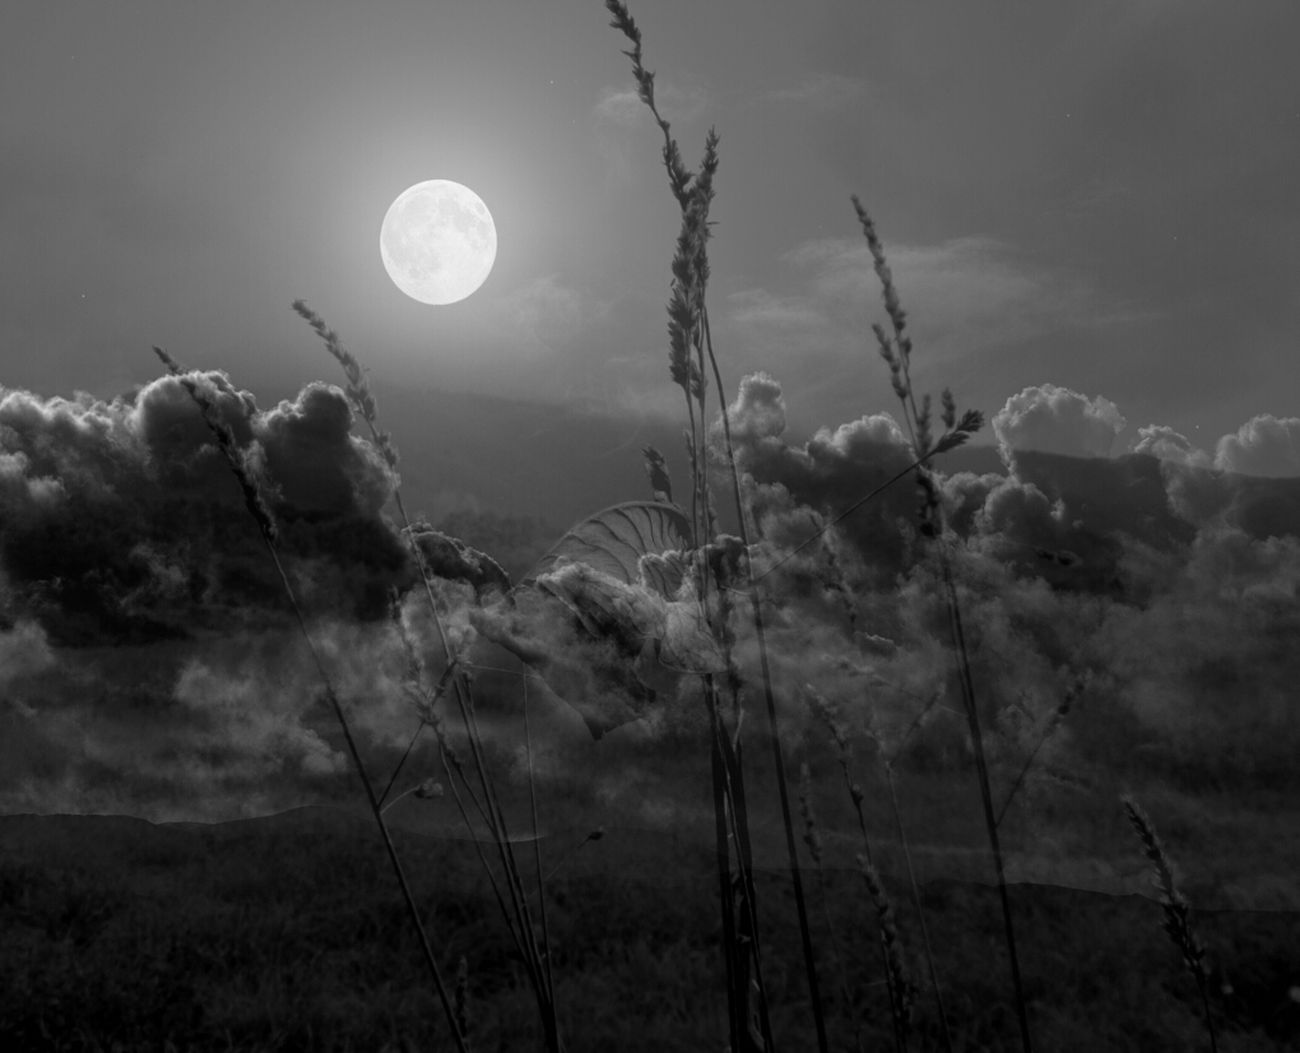 Blackandwhite Black And White Moon Monochrome Bnw Noir Et Blanc Blancoynegro All_shots